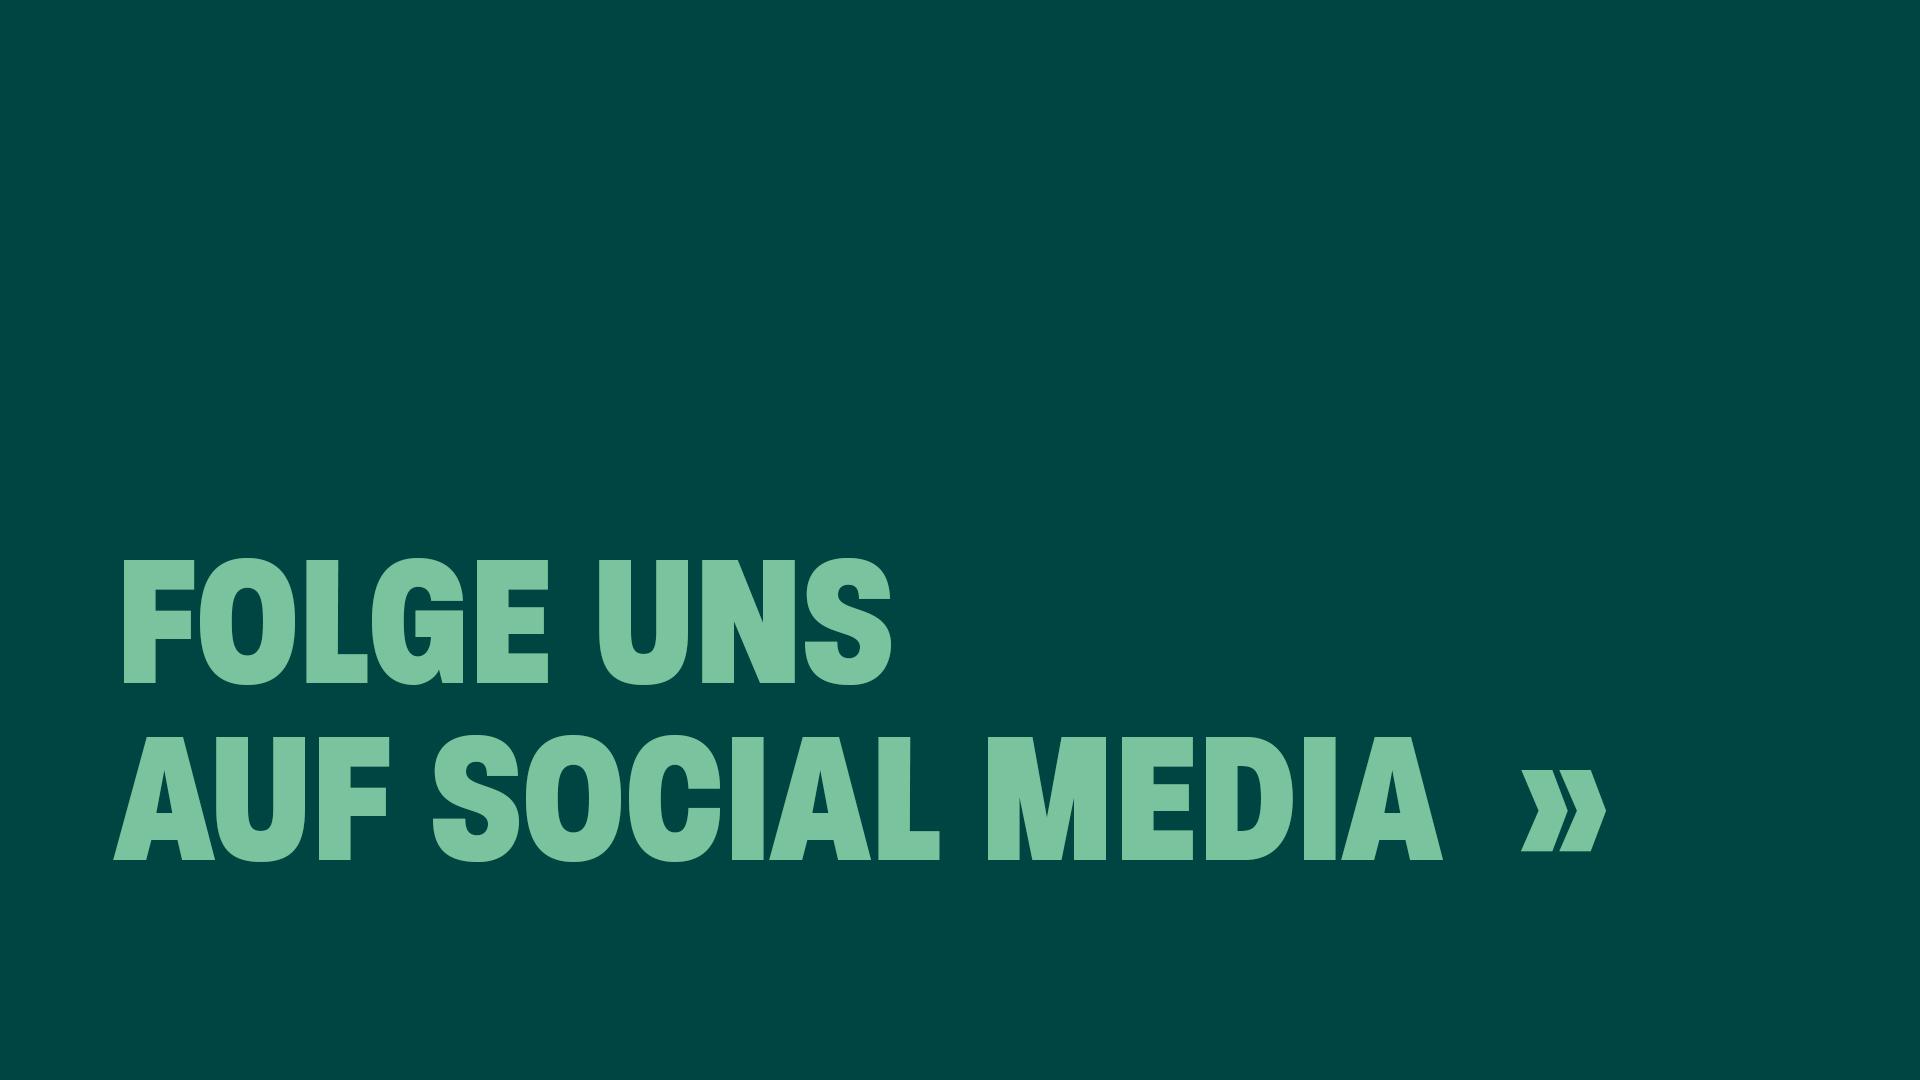 Folge uns auf Social Media